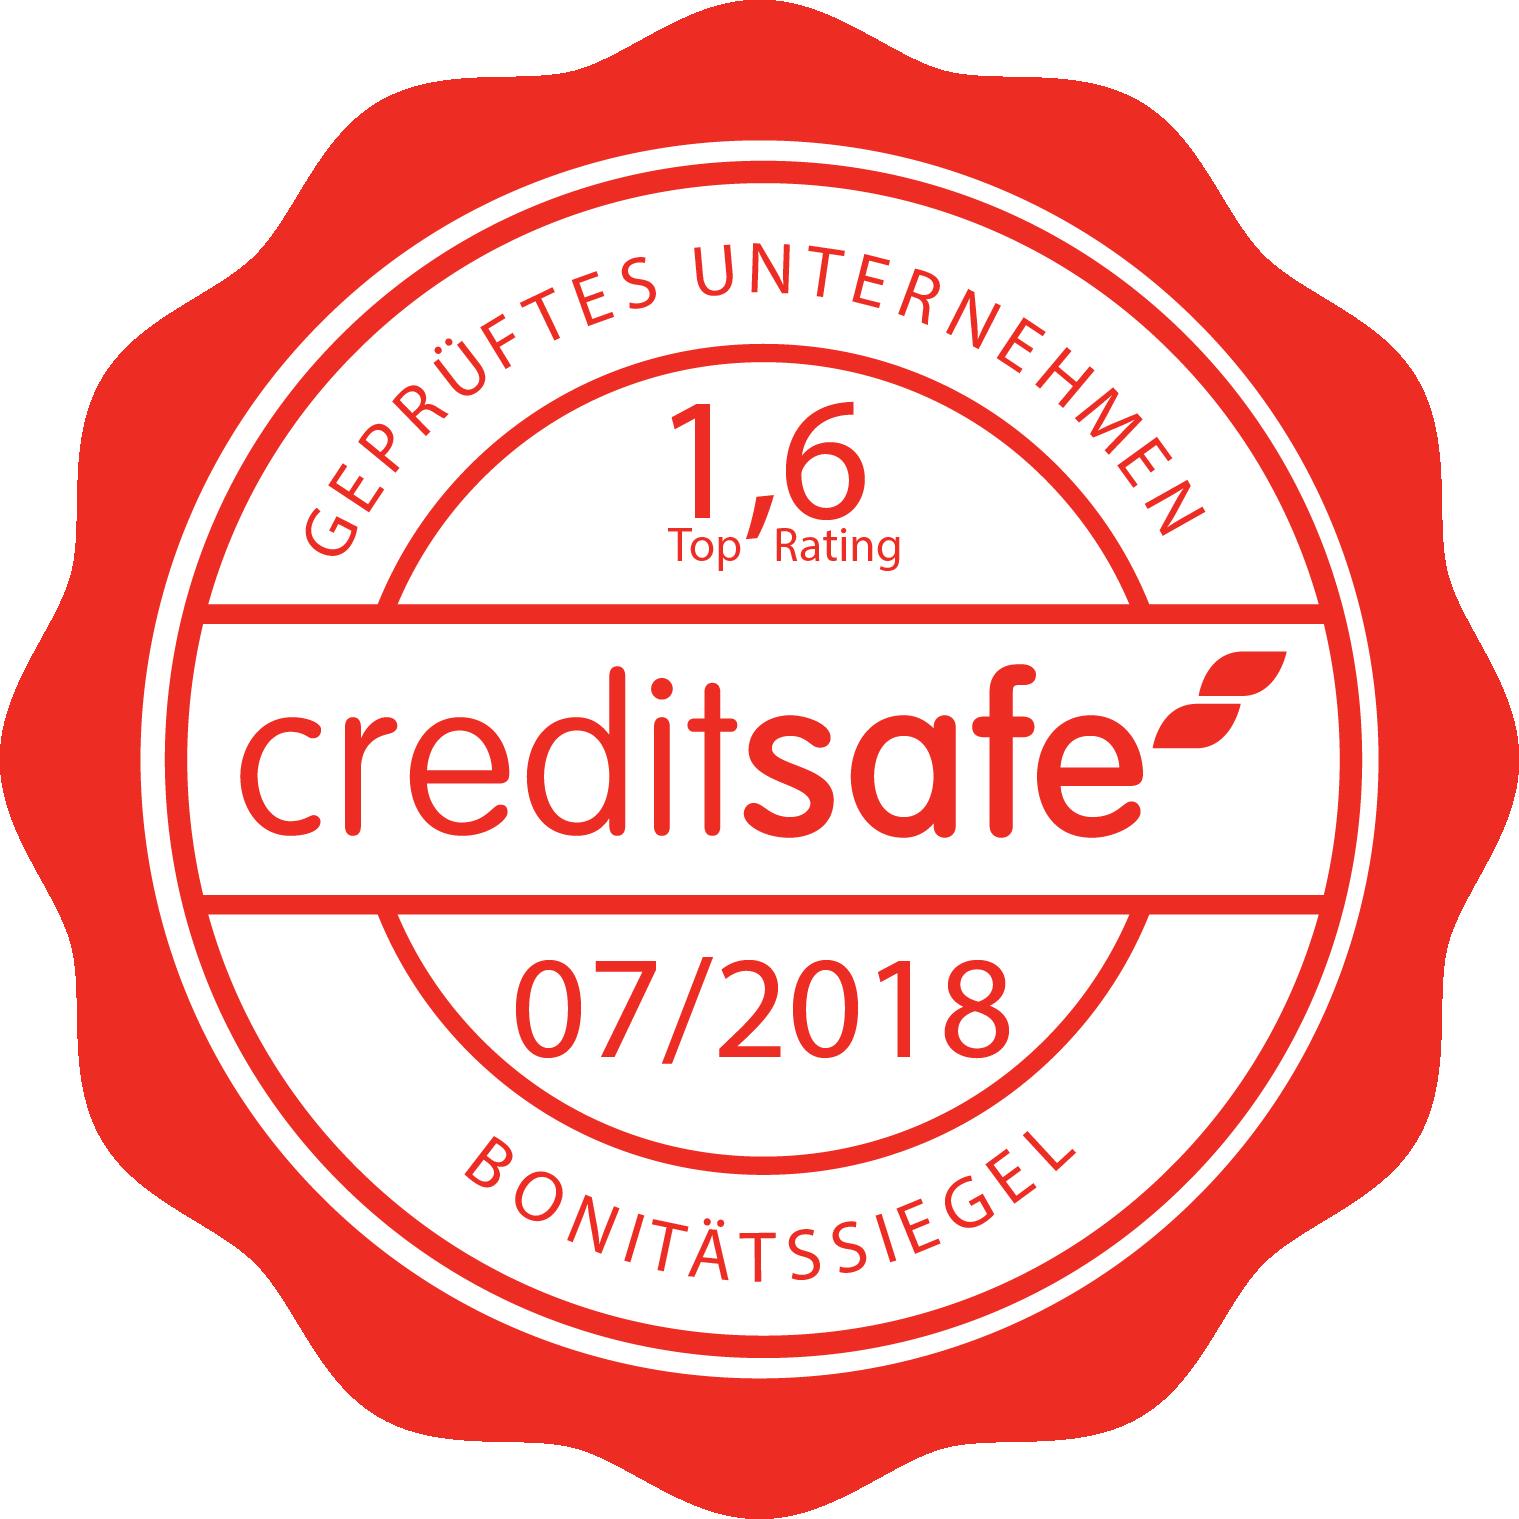 Creditsafe-Bonitaetssiegel-1-6_07_2018.png